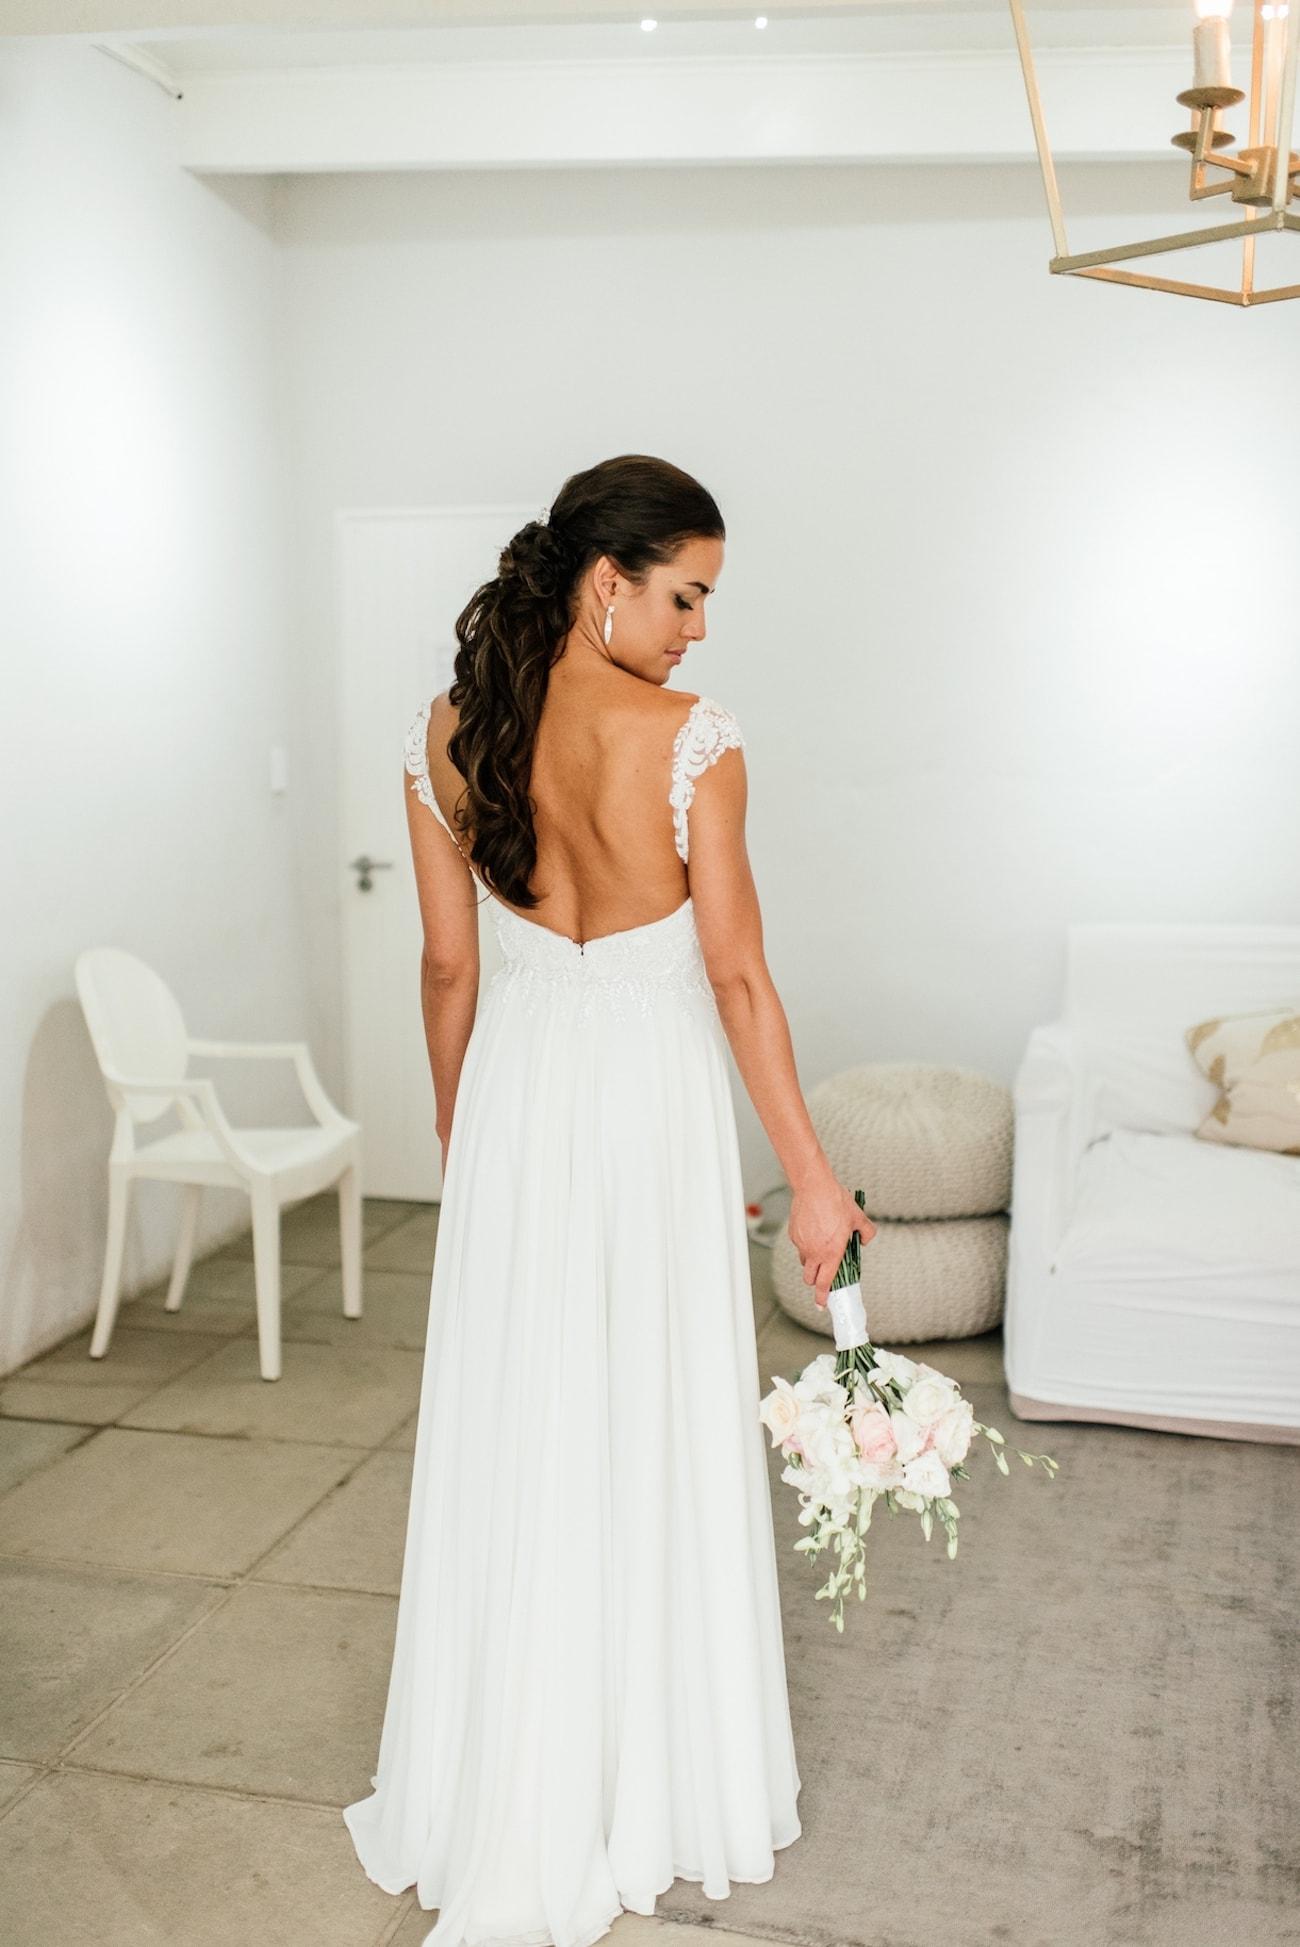 Jeanelle l'Amour Wedding Dress   Image: Carla Adel